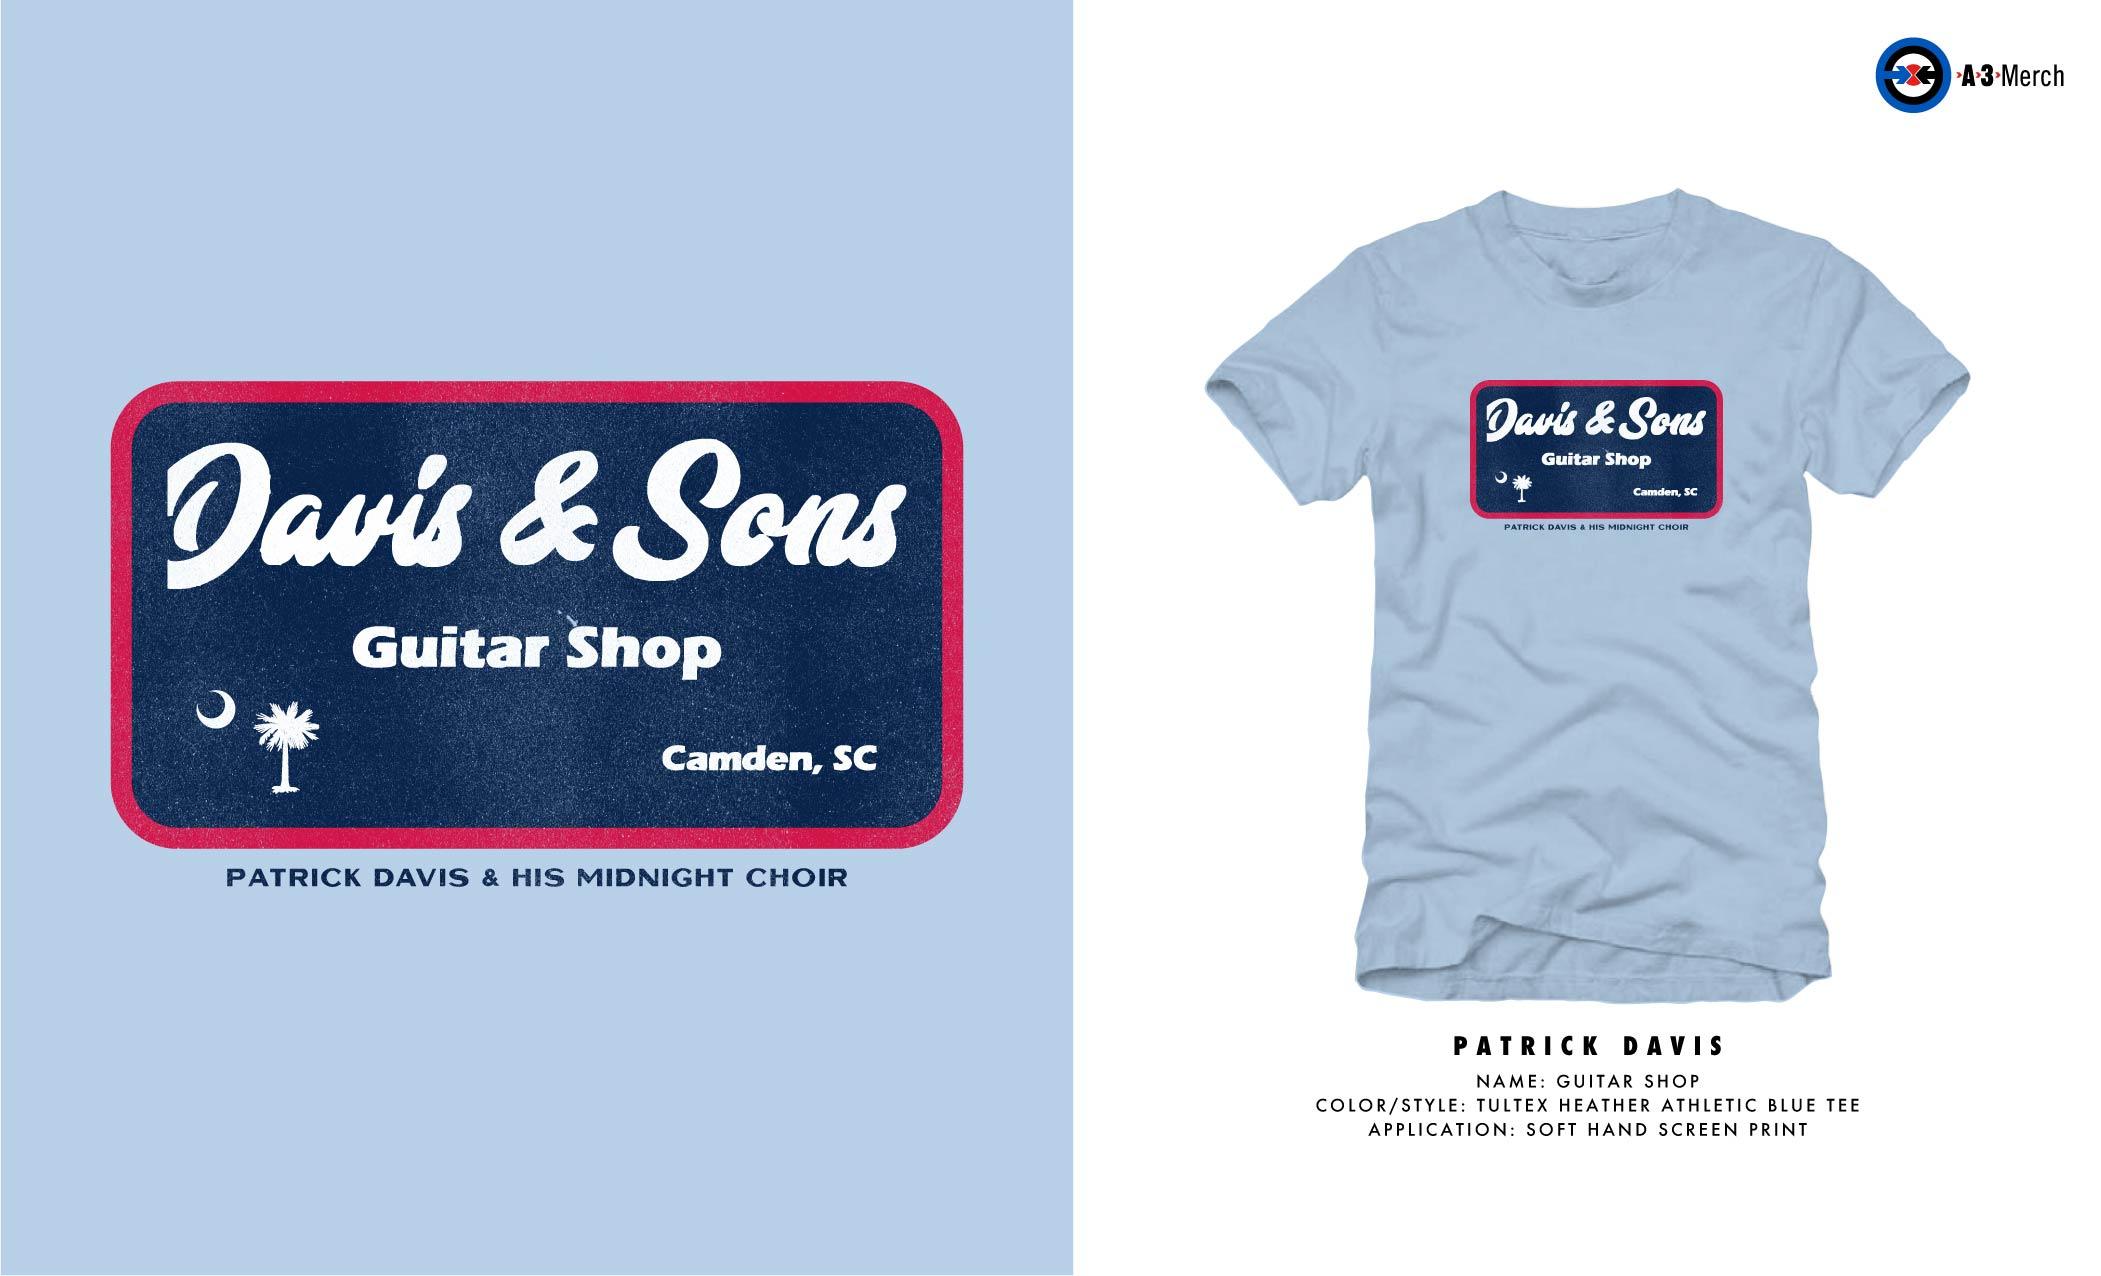 DAVIS & SONS Guitar Shop Tee